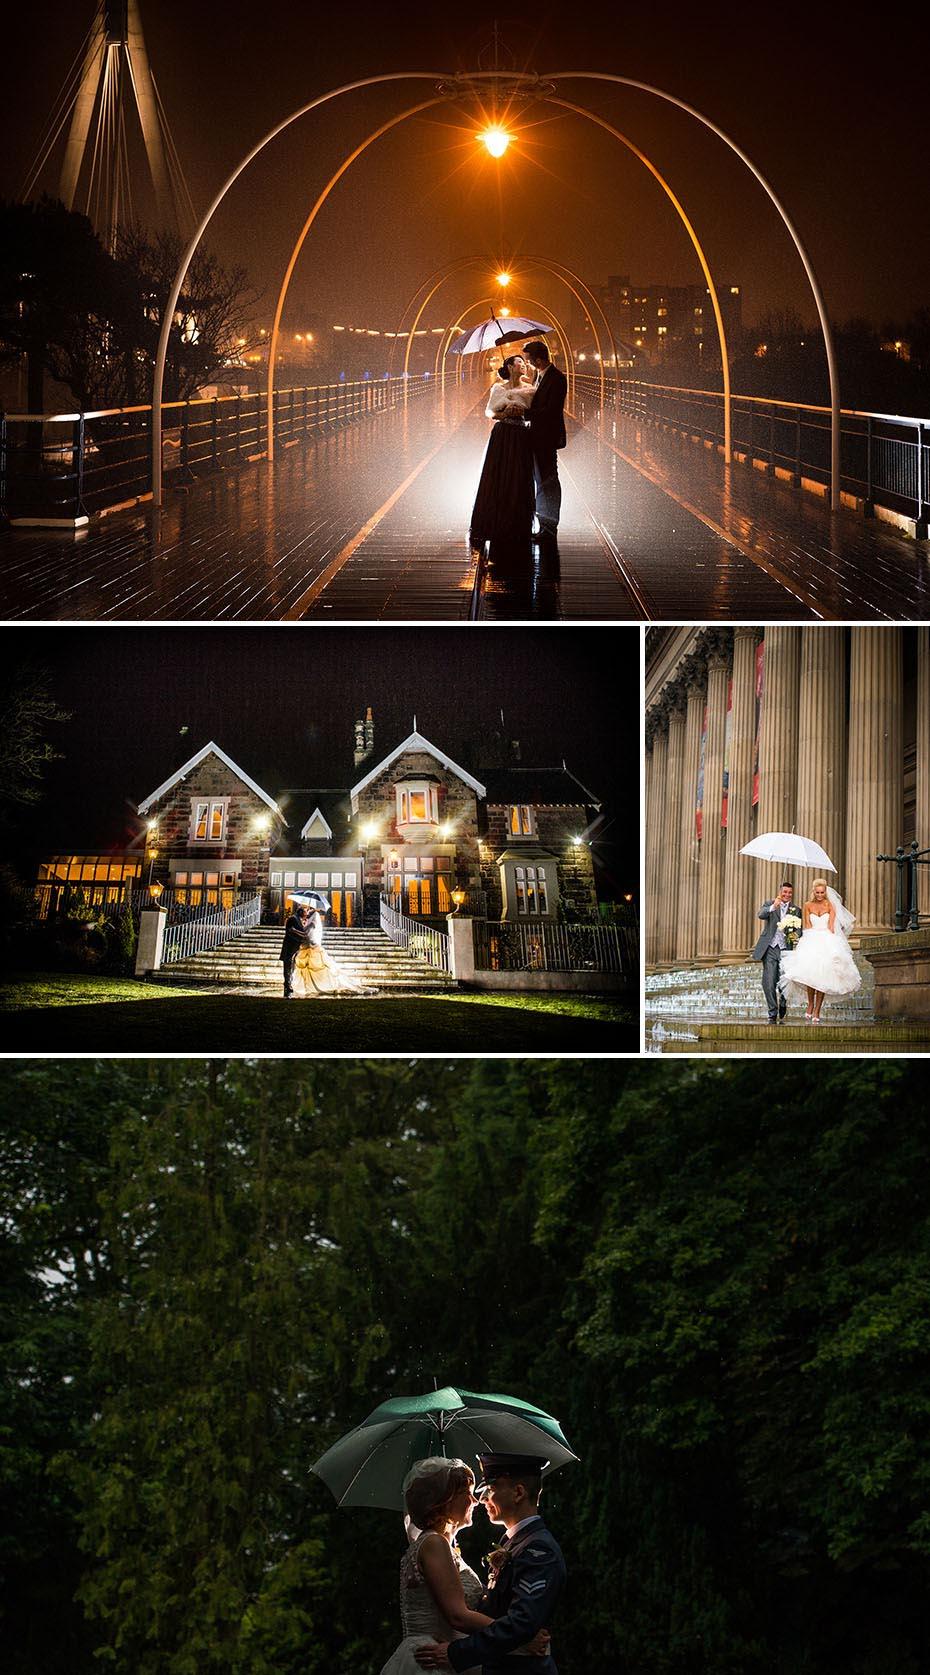 winter-wedding-photography-matthew-rycraft